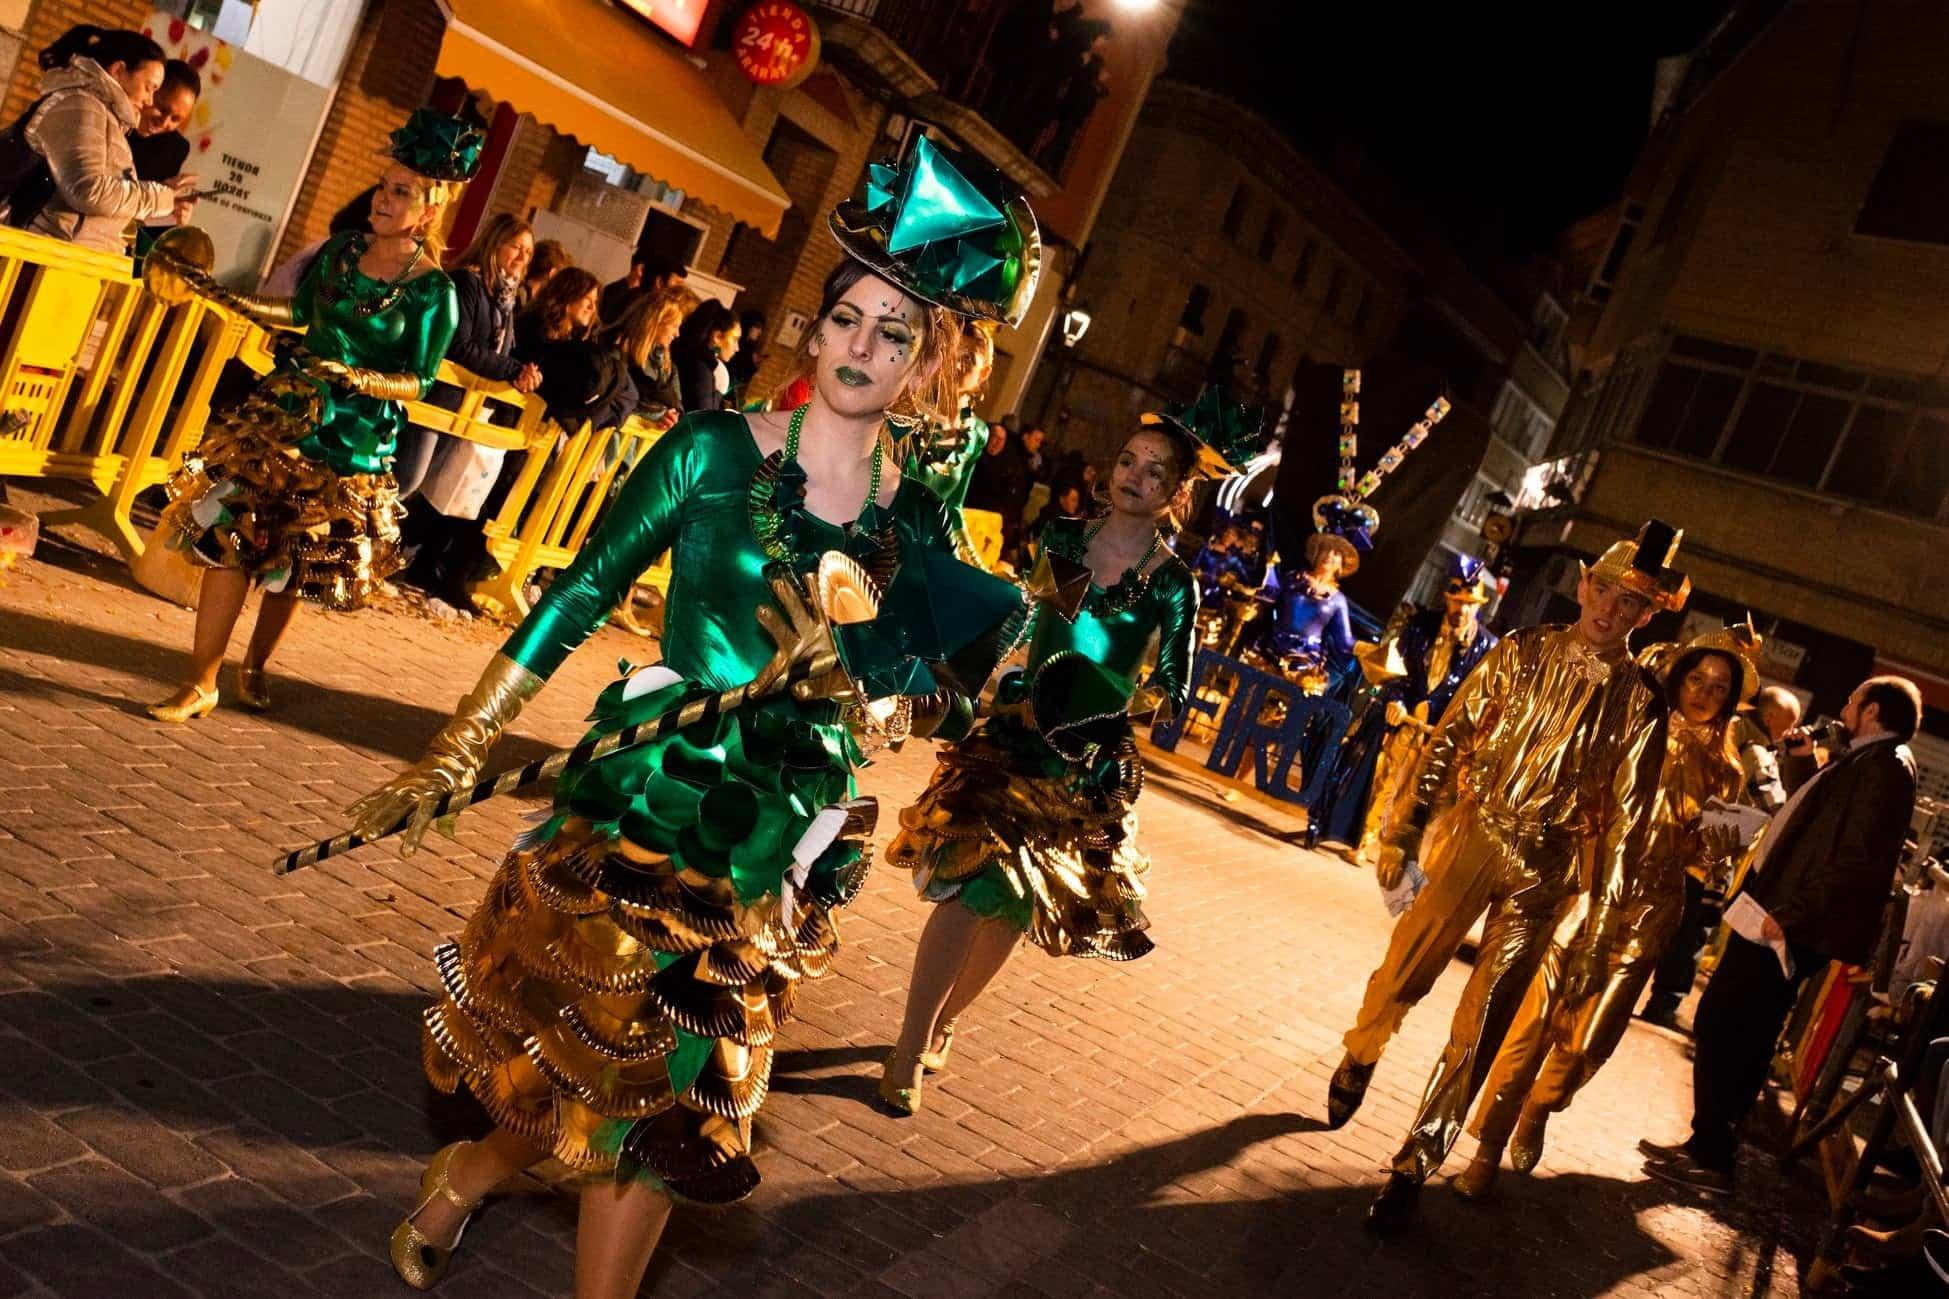 Carnaval de herencia 2020 ofertorio 26 - Selección de fotografías del Ofertorio del Carnaval de Herencia